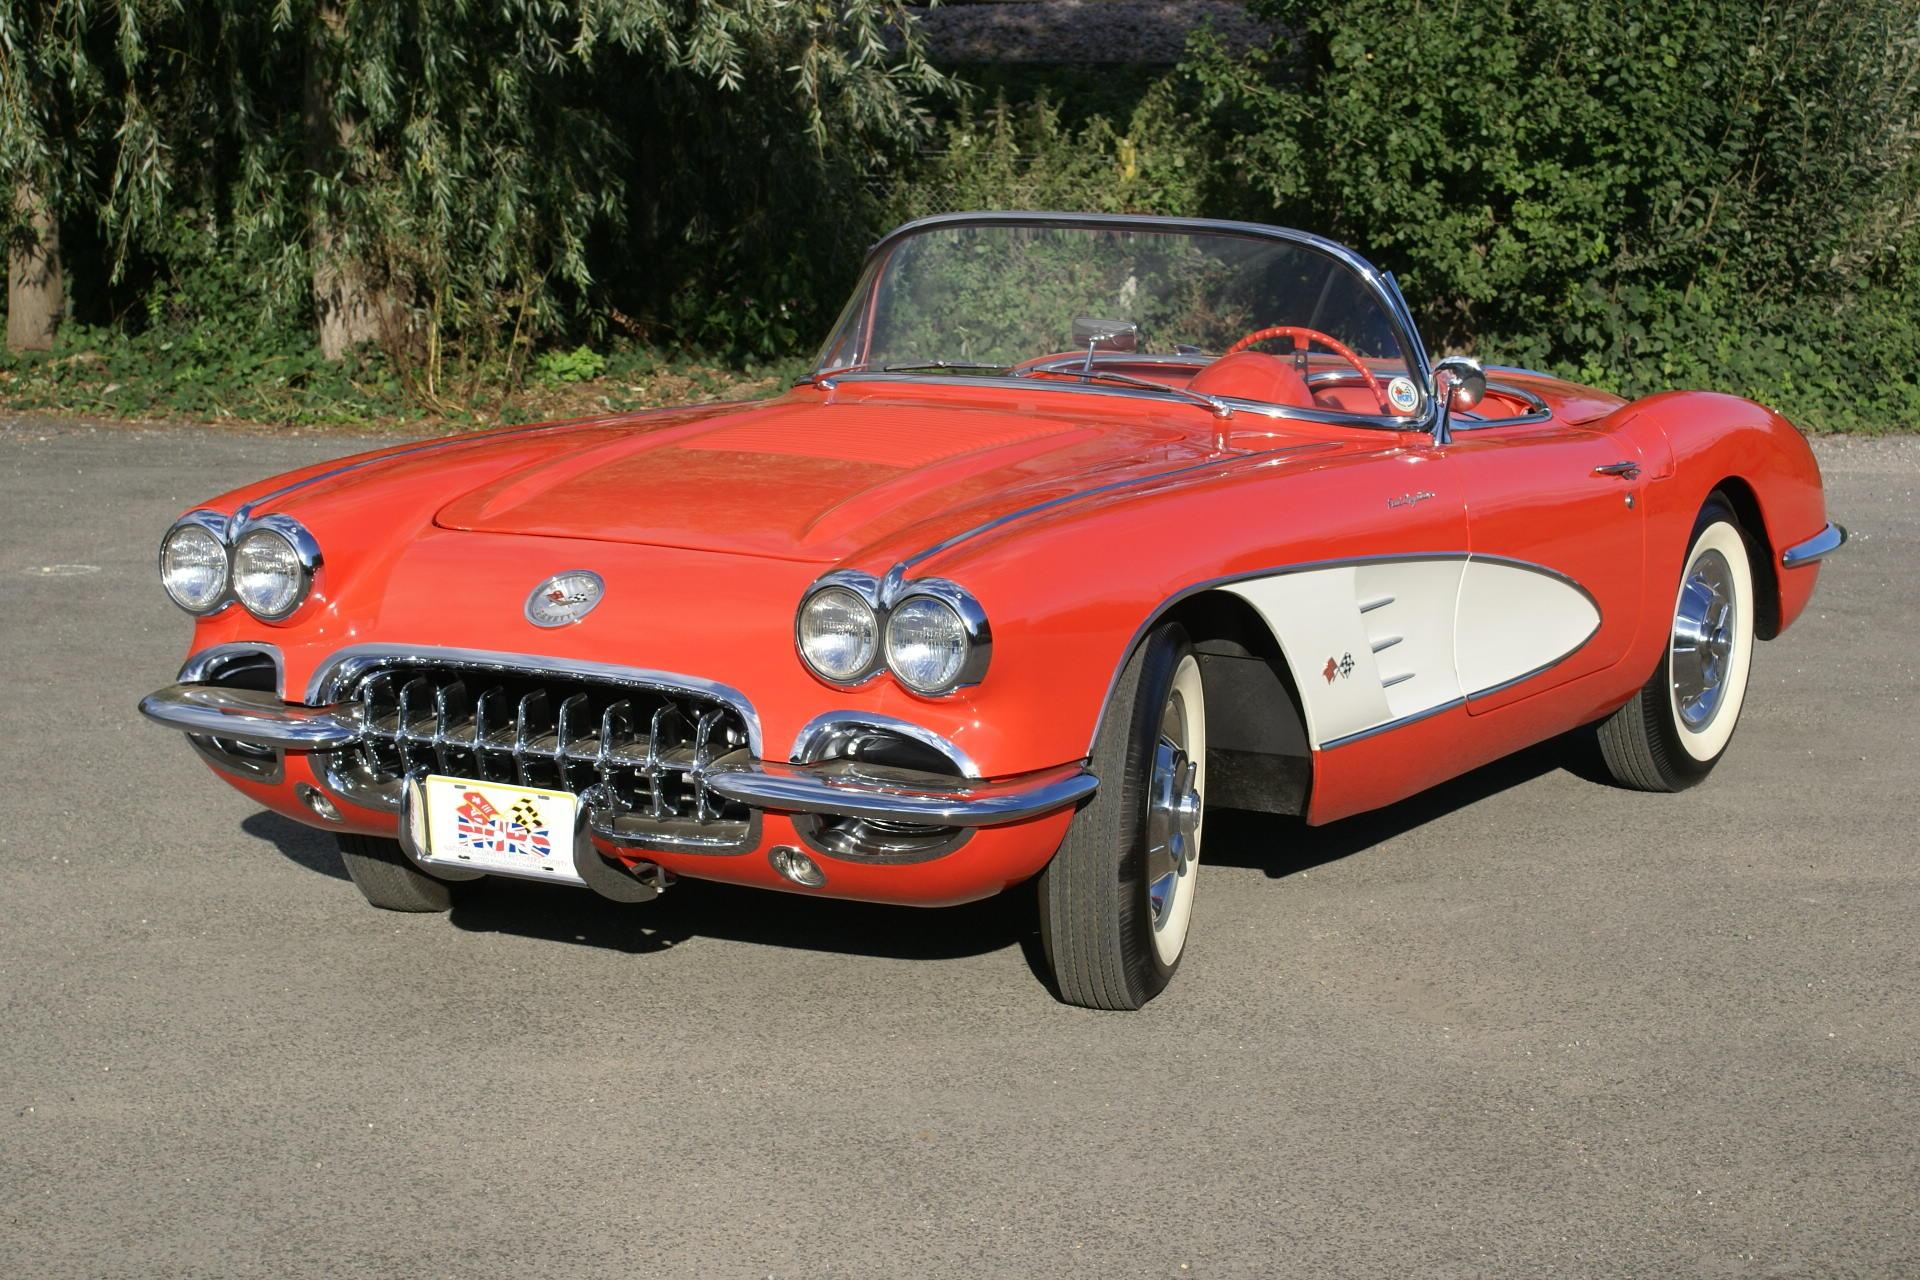 The 2006 NCRS 'Triple Crown'-winning 1958 Chevrolet Corvette Roadster...